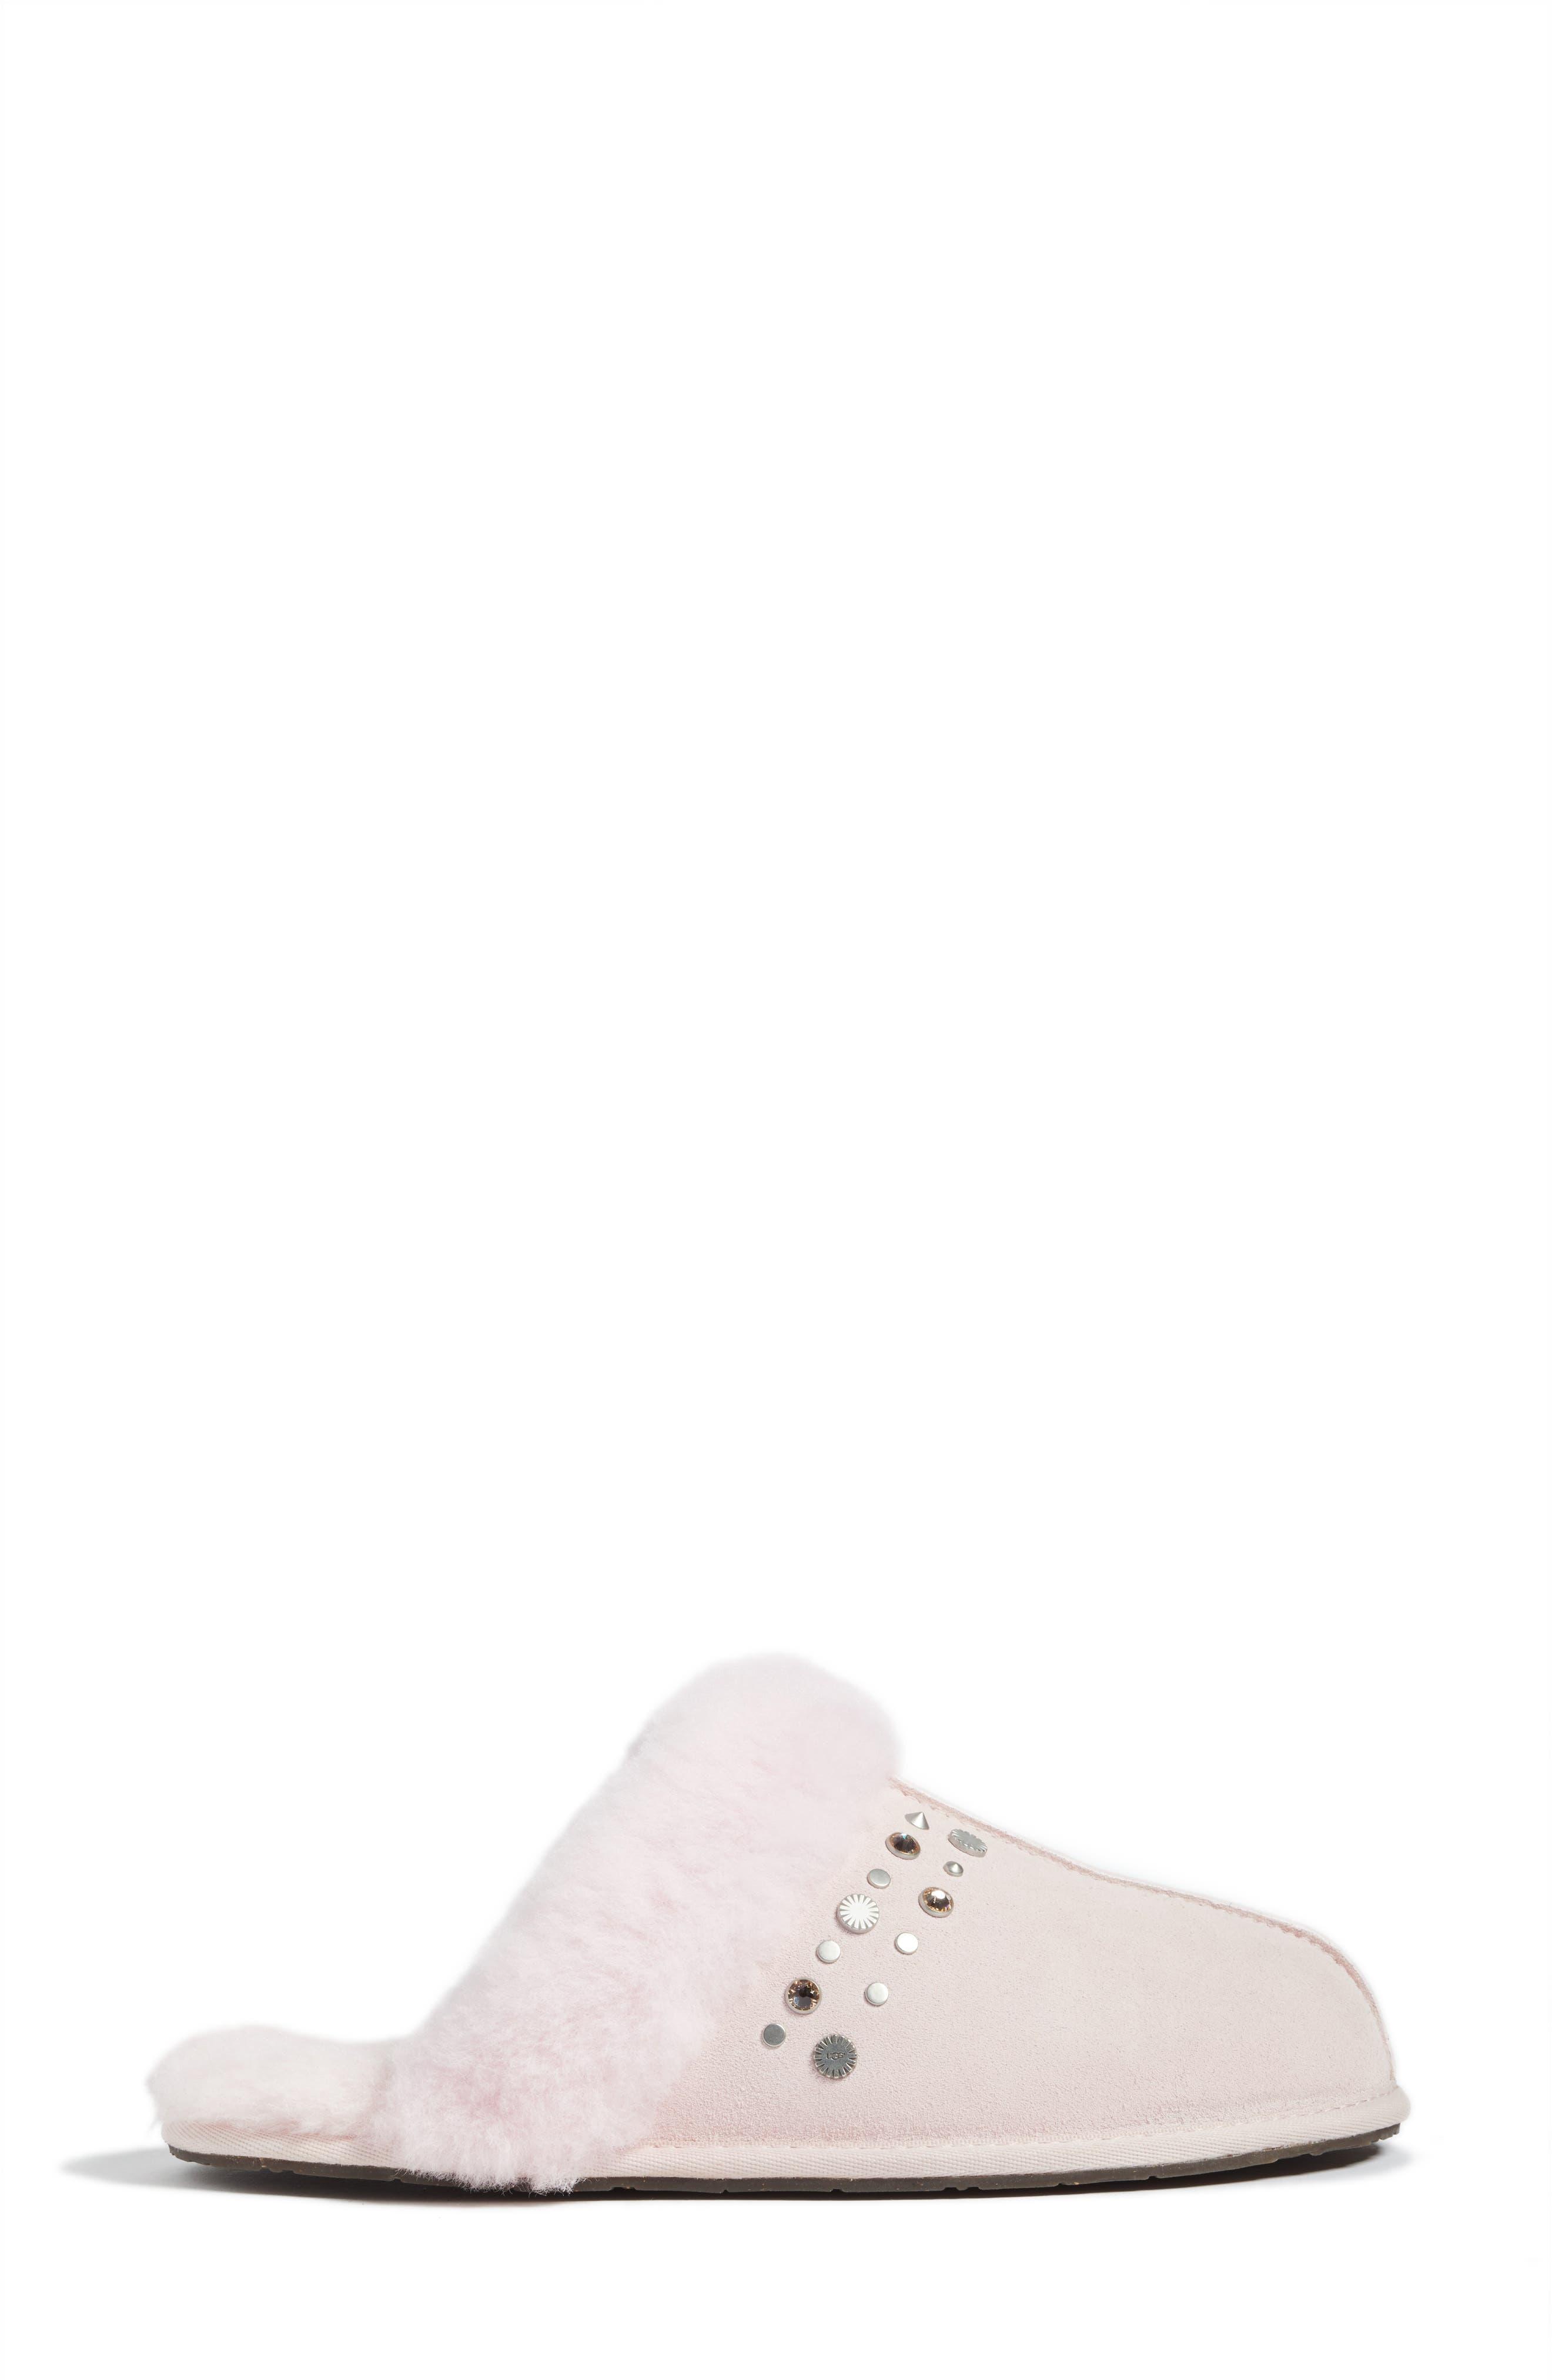 Scuffette II Studded Slipper,                             Alternate thumbnail 4, color,                             Seashell Pink